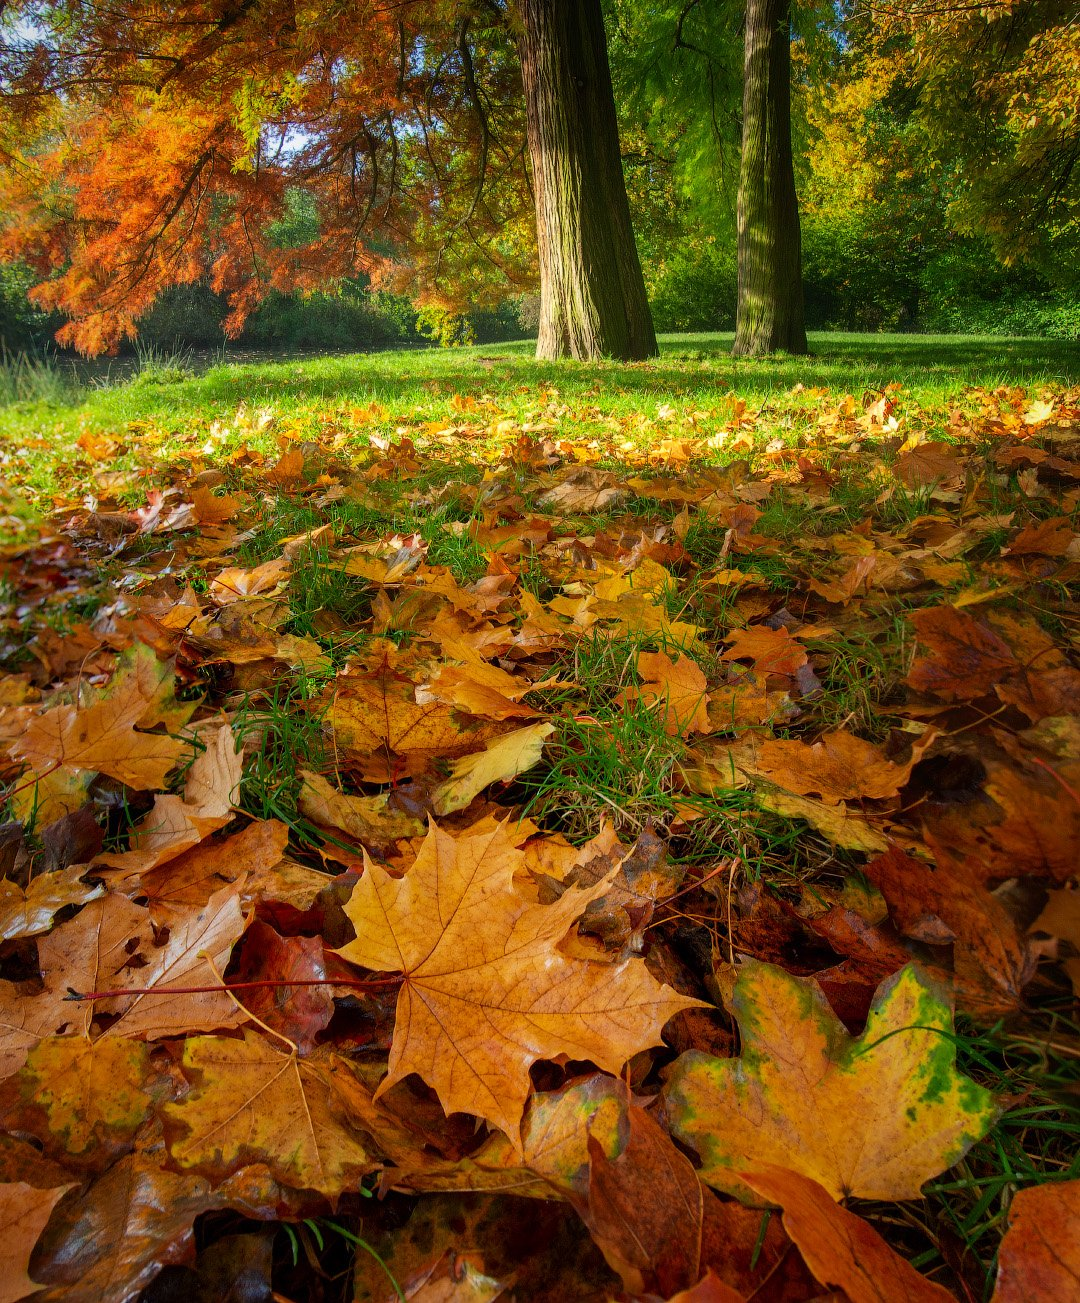 осень, утро, парк, autumn, morning, park, Виктор Тулбанов